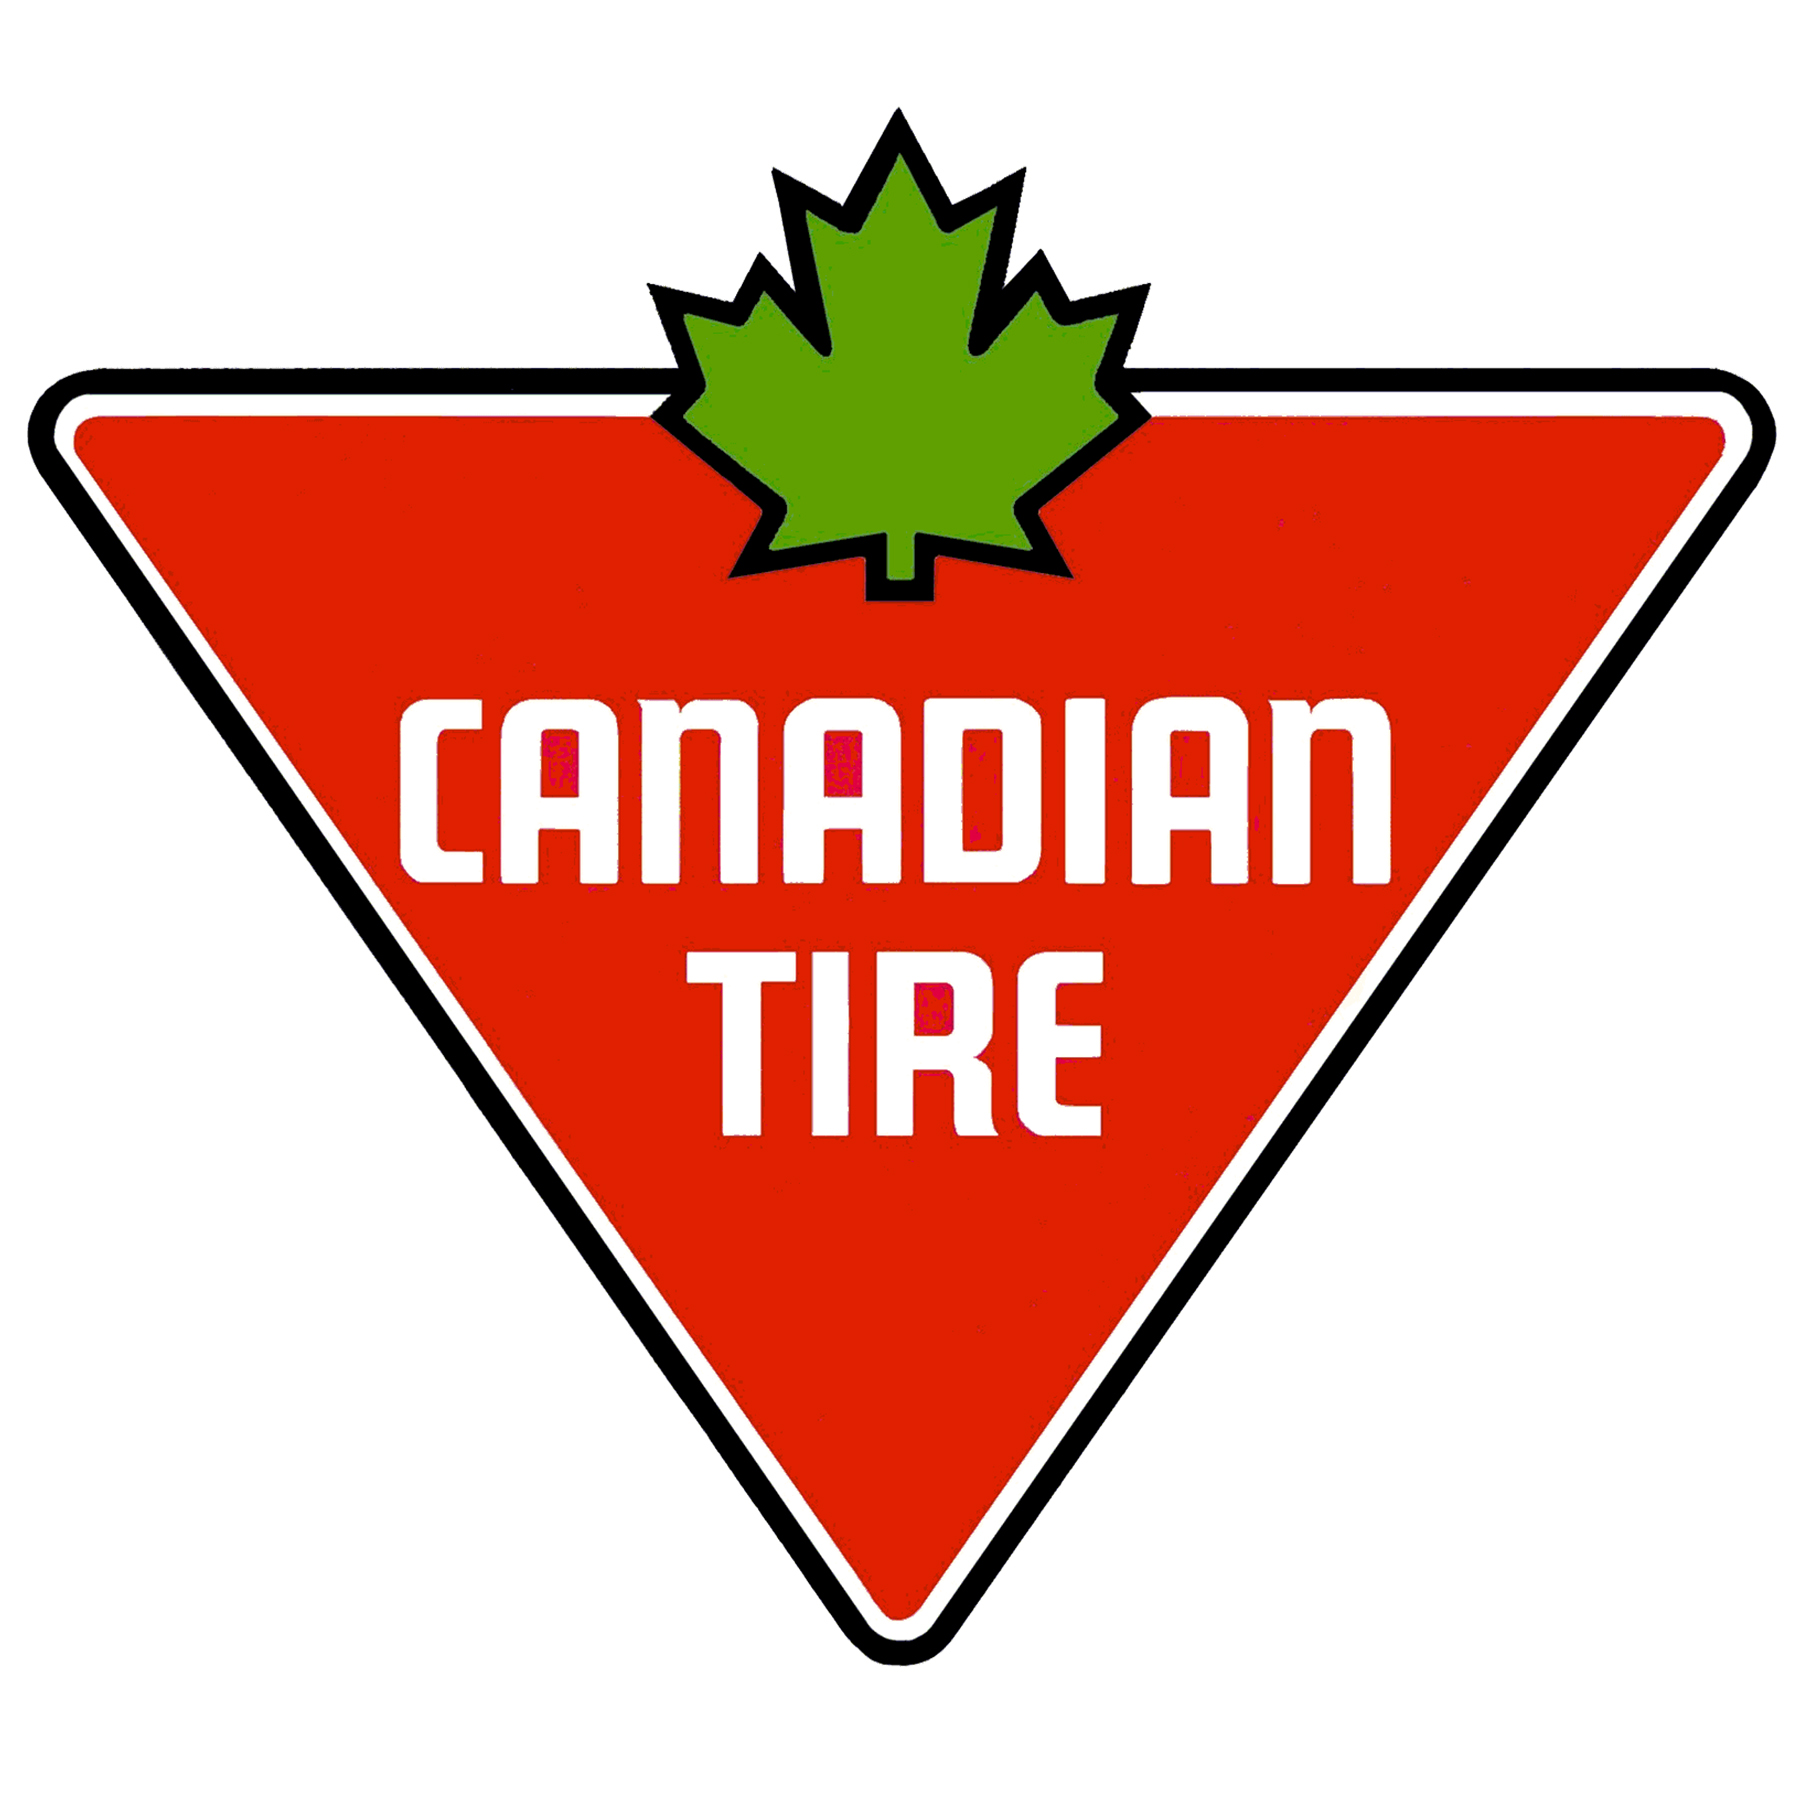 Canadian Tire | Department stores | Place Vertu